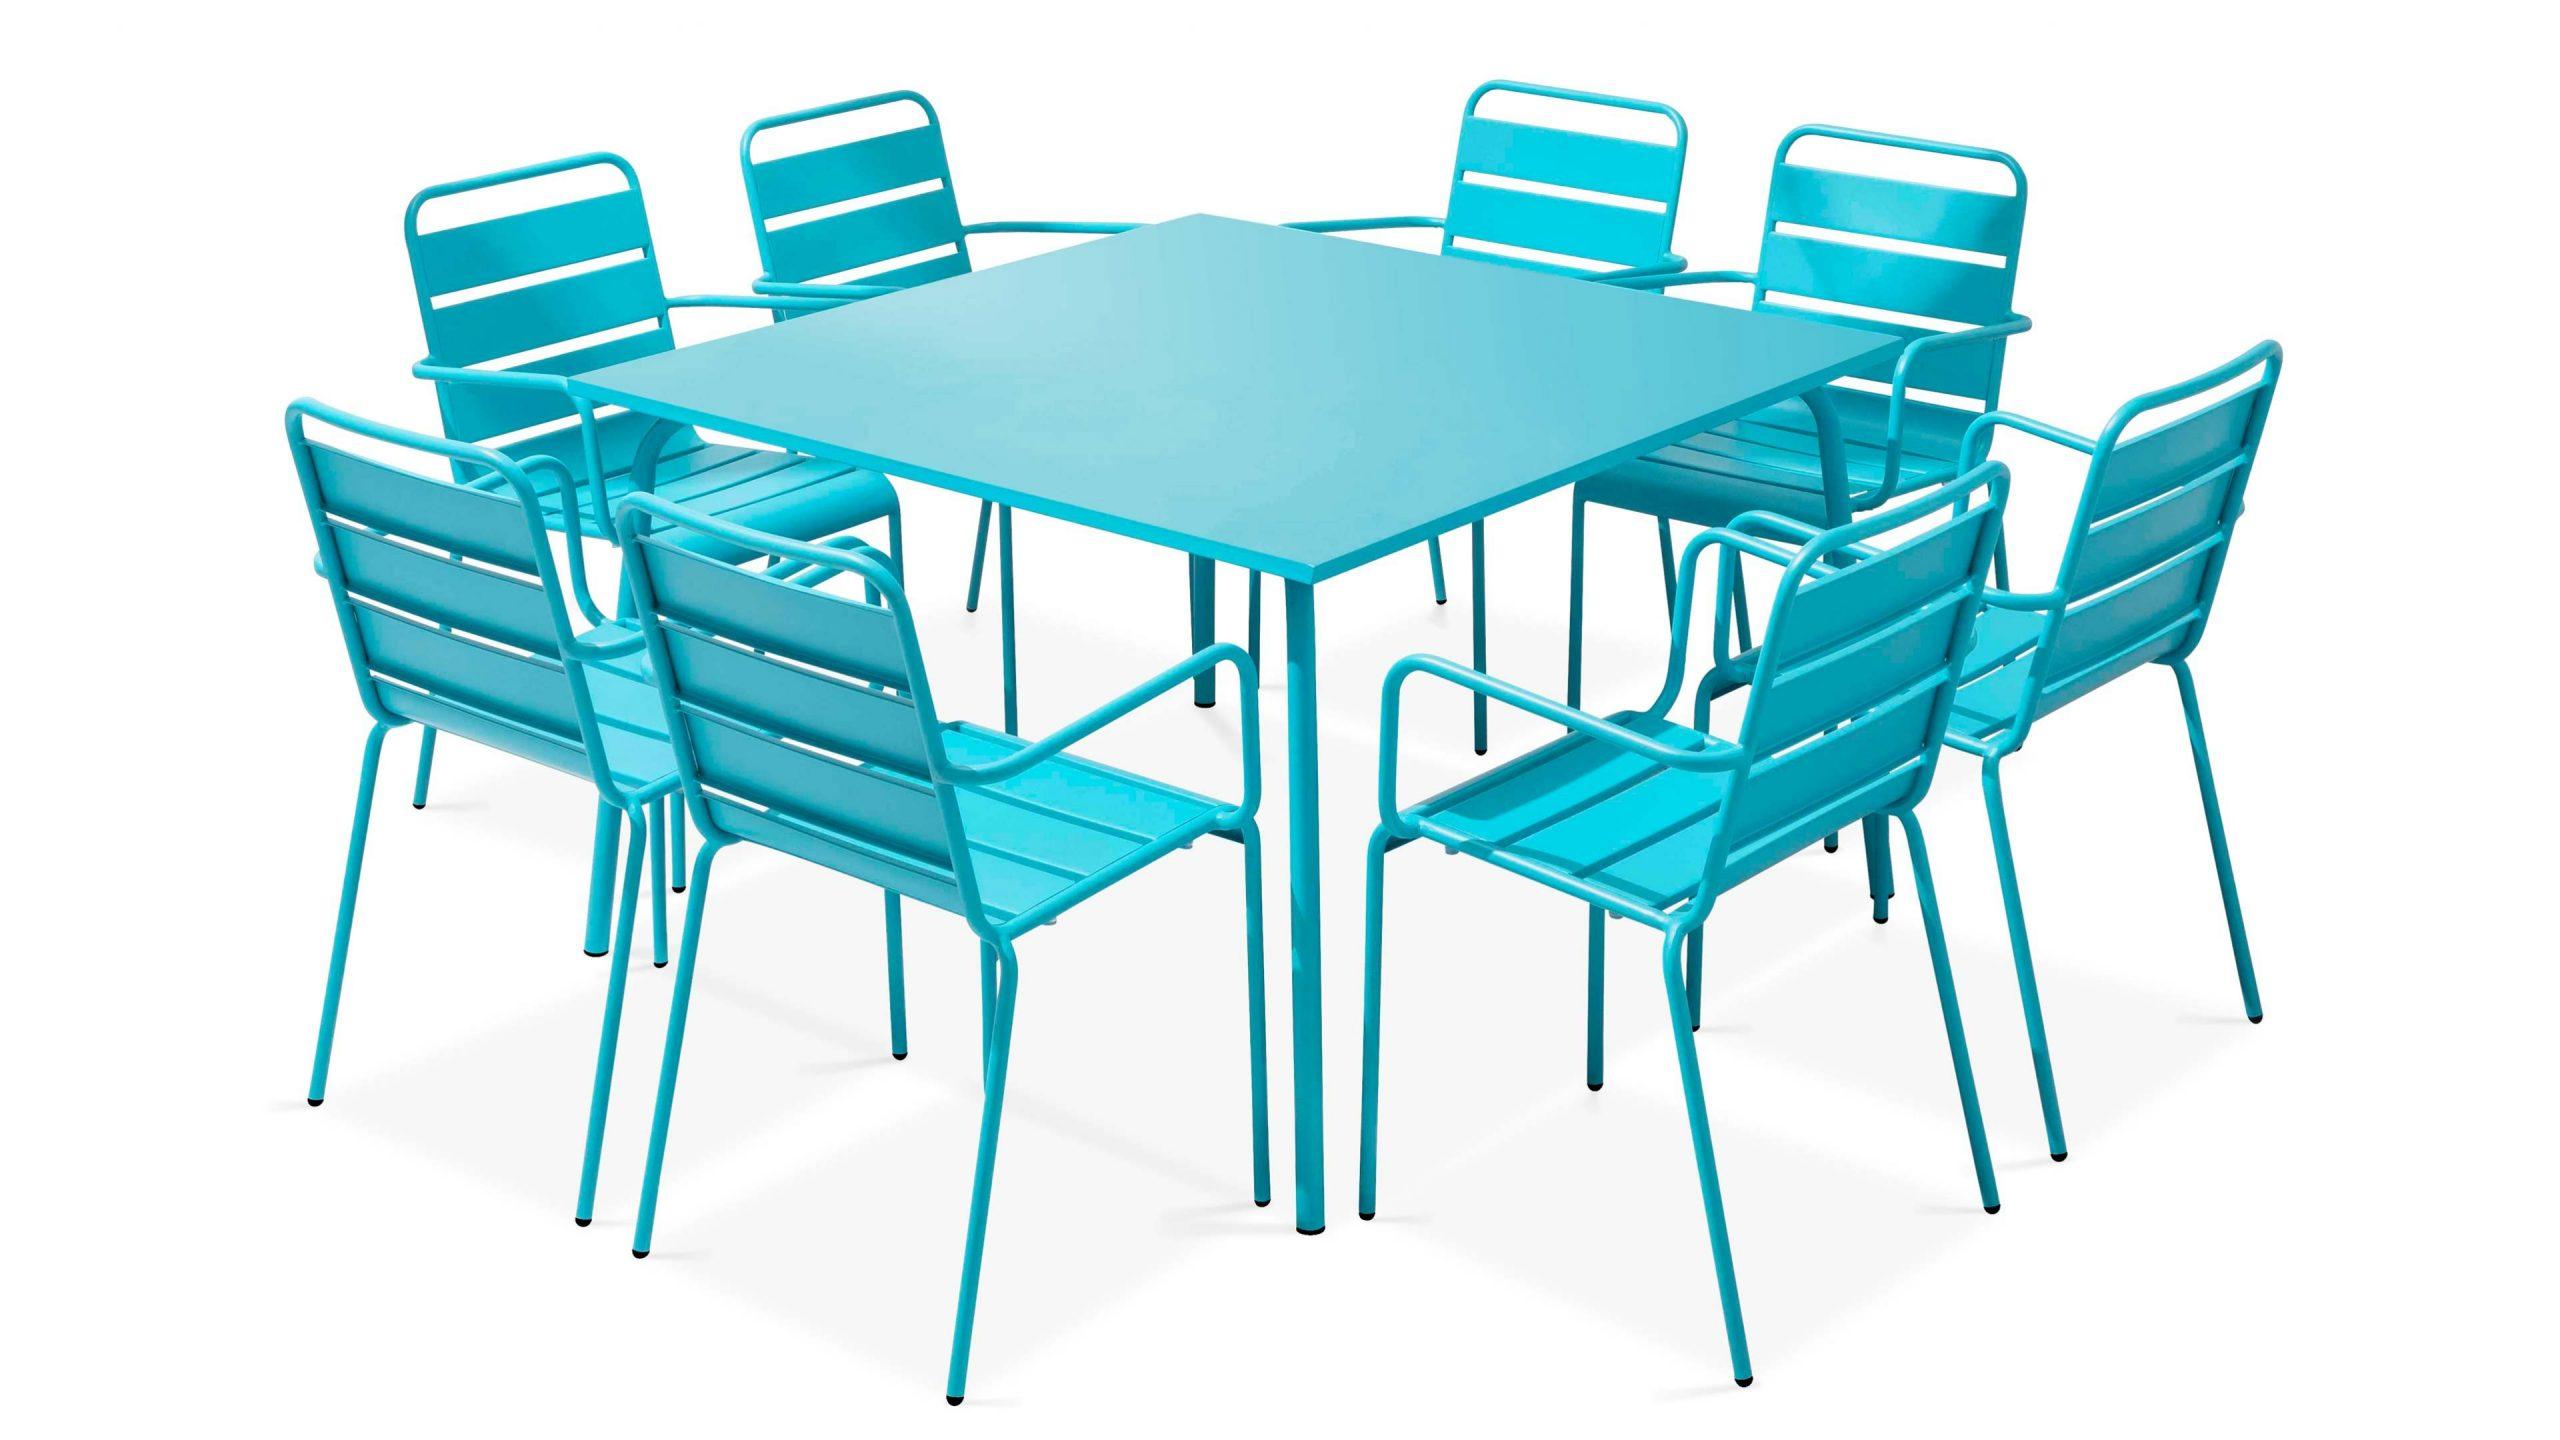 Table Carrée De Jardin En Métal 8 Places | Oviala intérieur Table De Jardin Carre